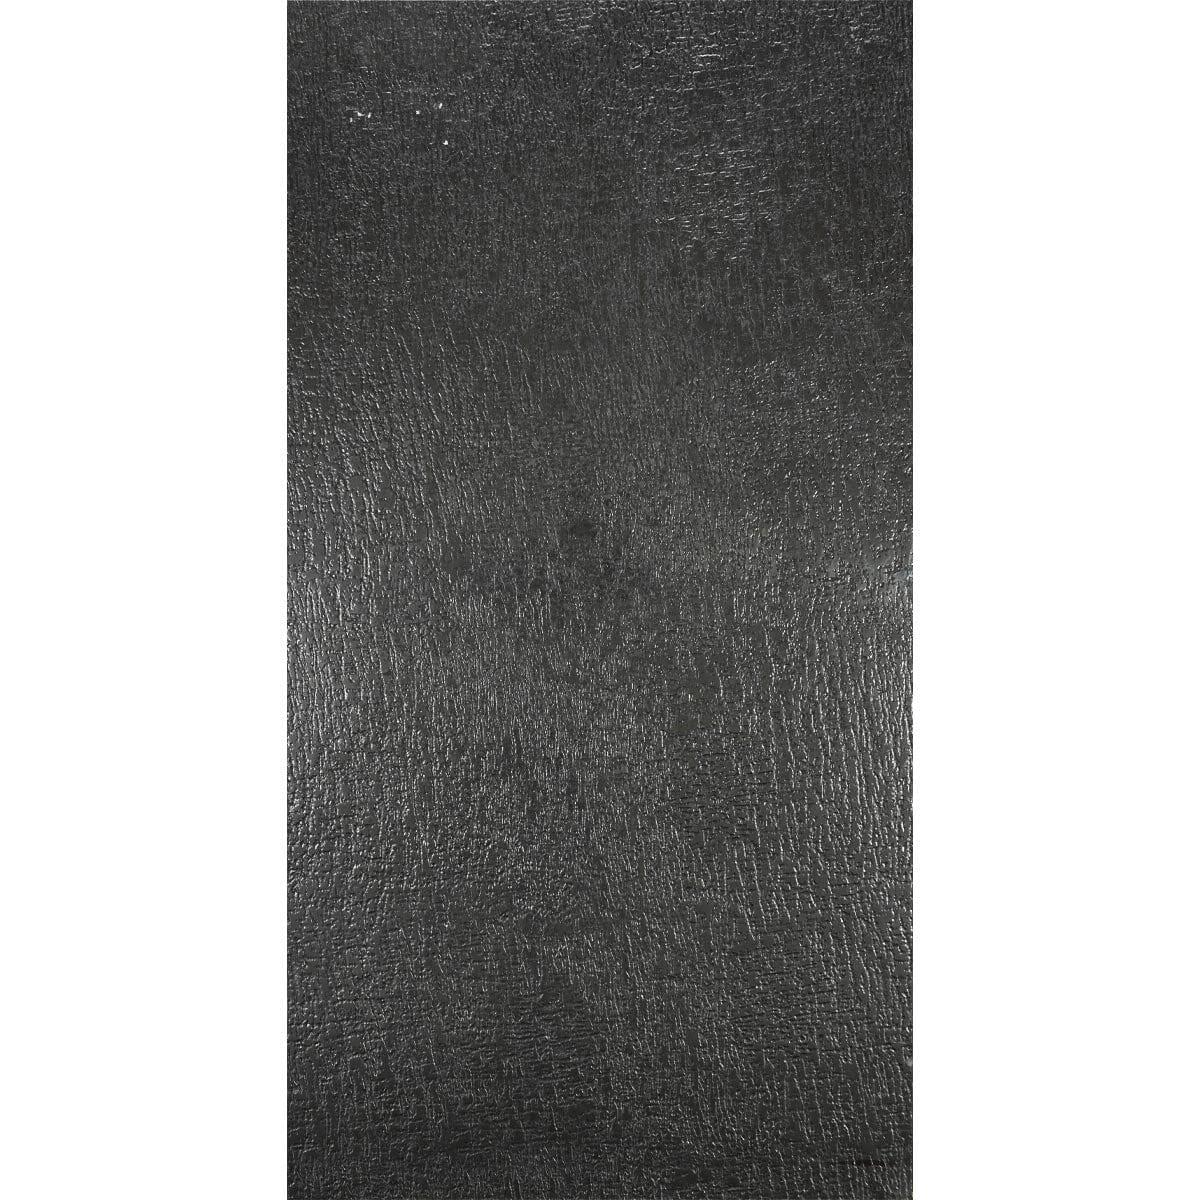 GUSTO FABRIC BLACK T10410 P1